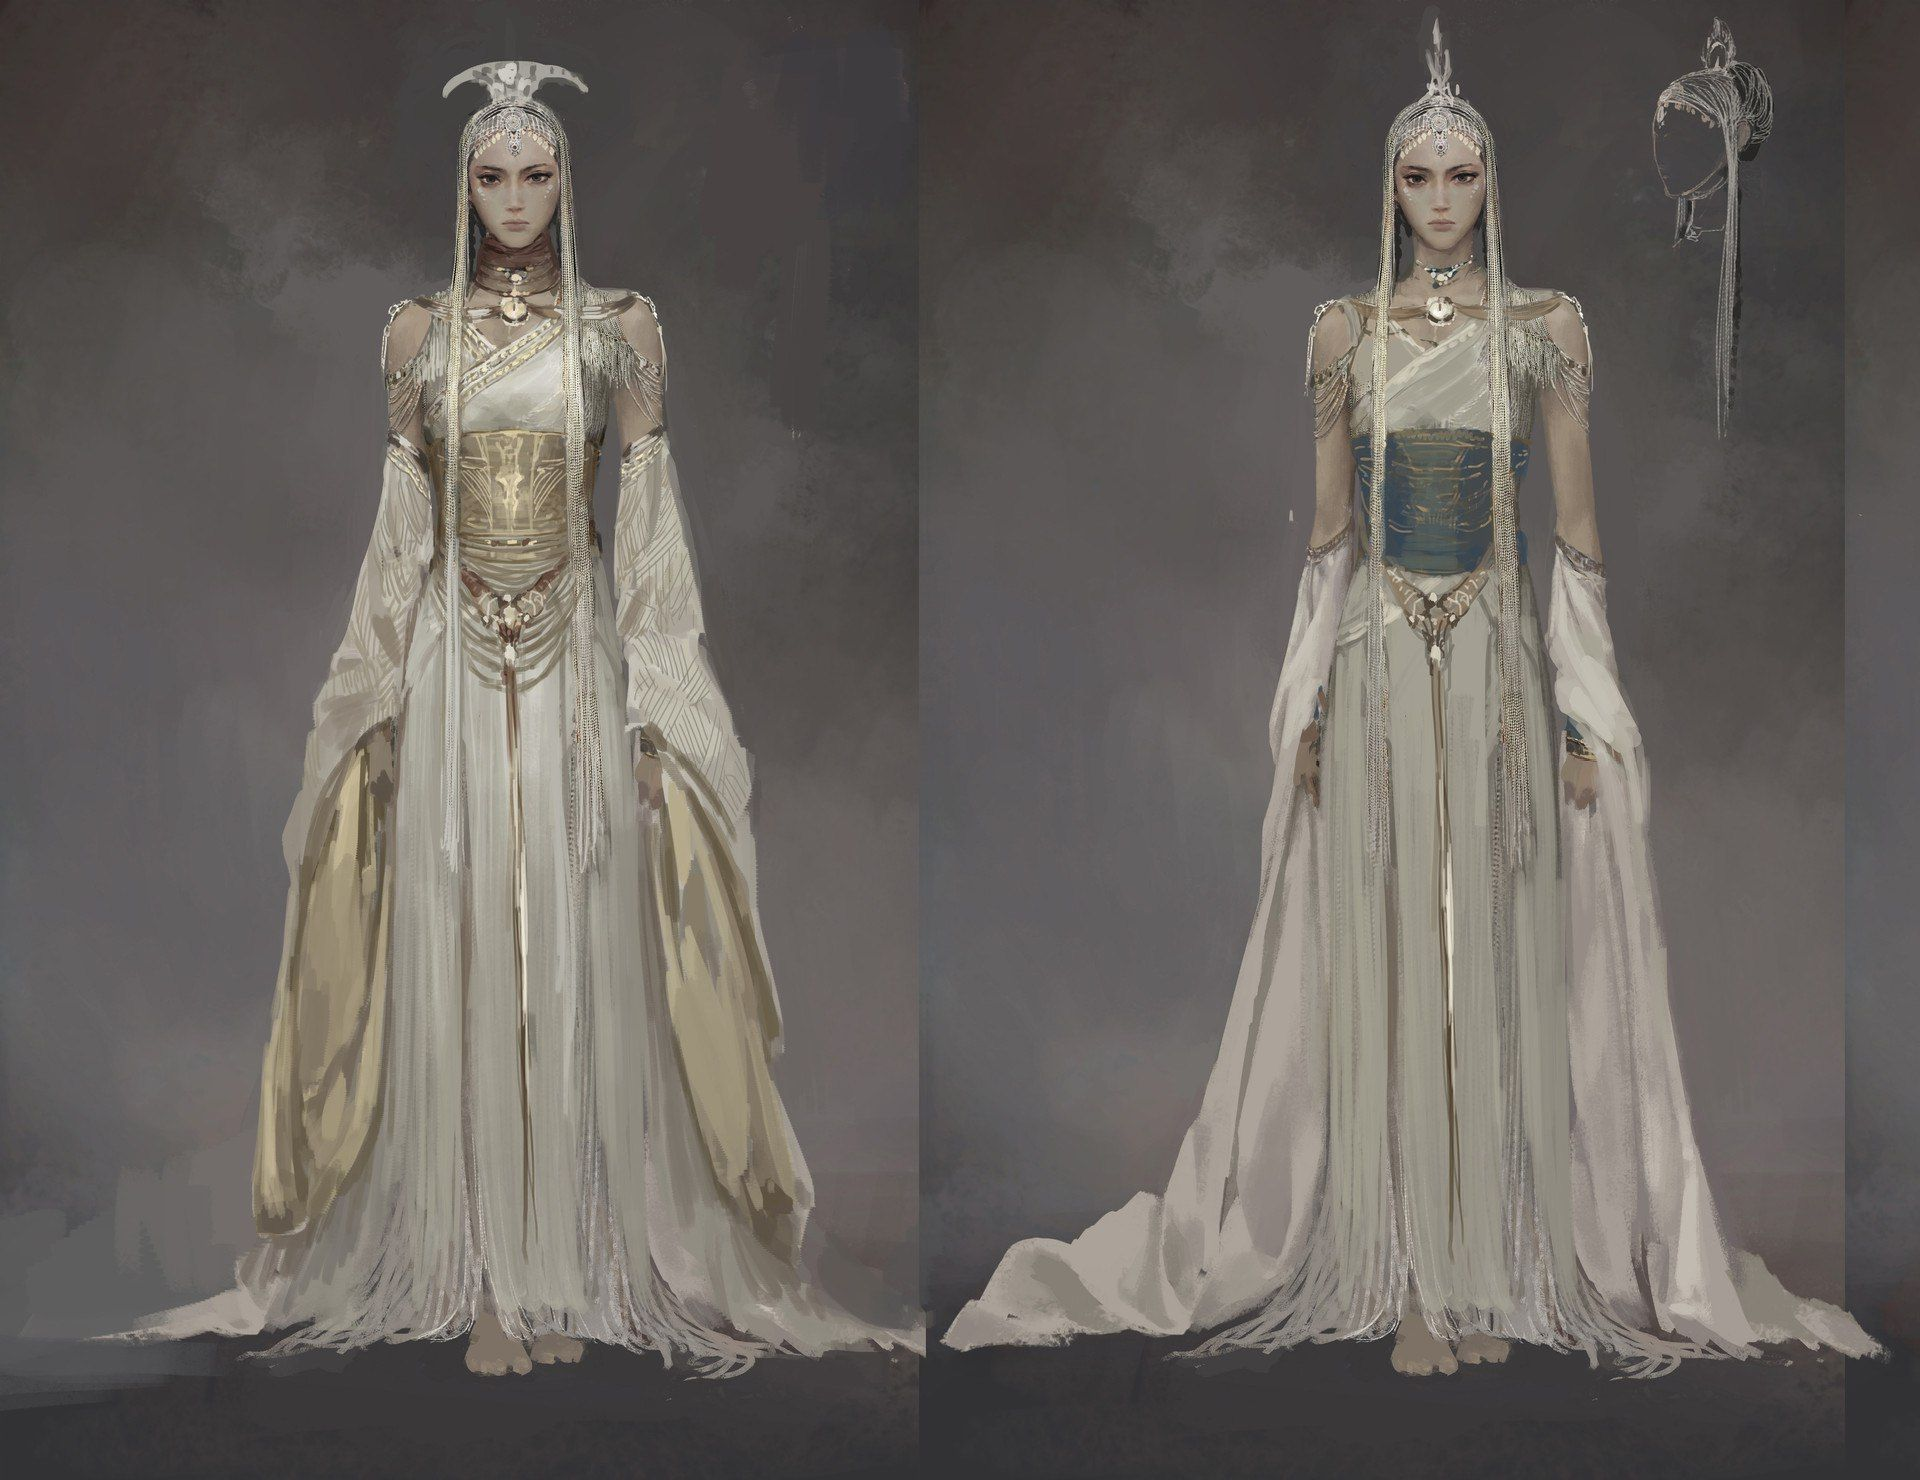 Concept Art In 2019 Fantasy Gowns Costume Design Fantasy